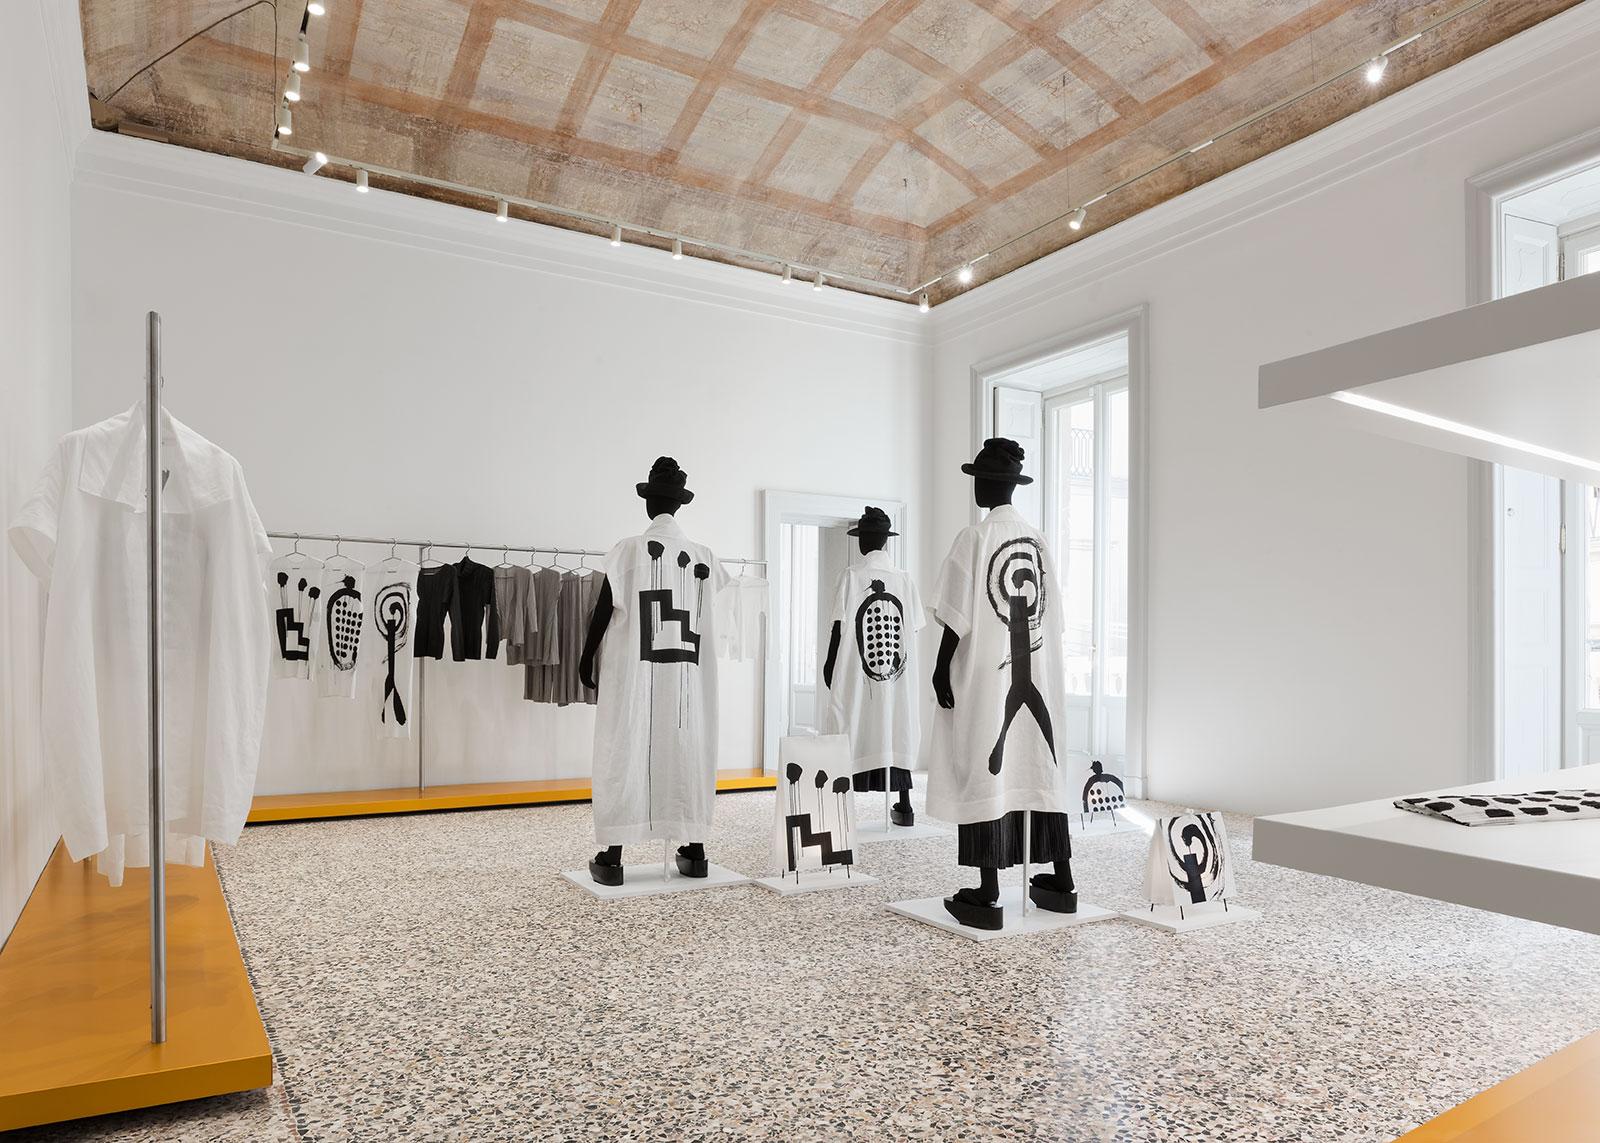 issey miyake a milano il primo flagship store italiano